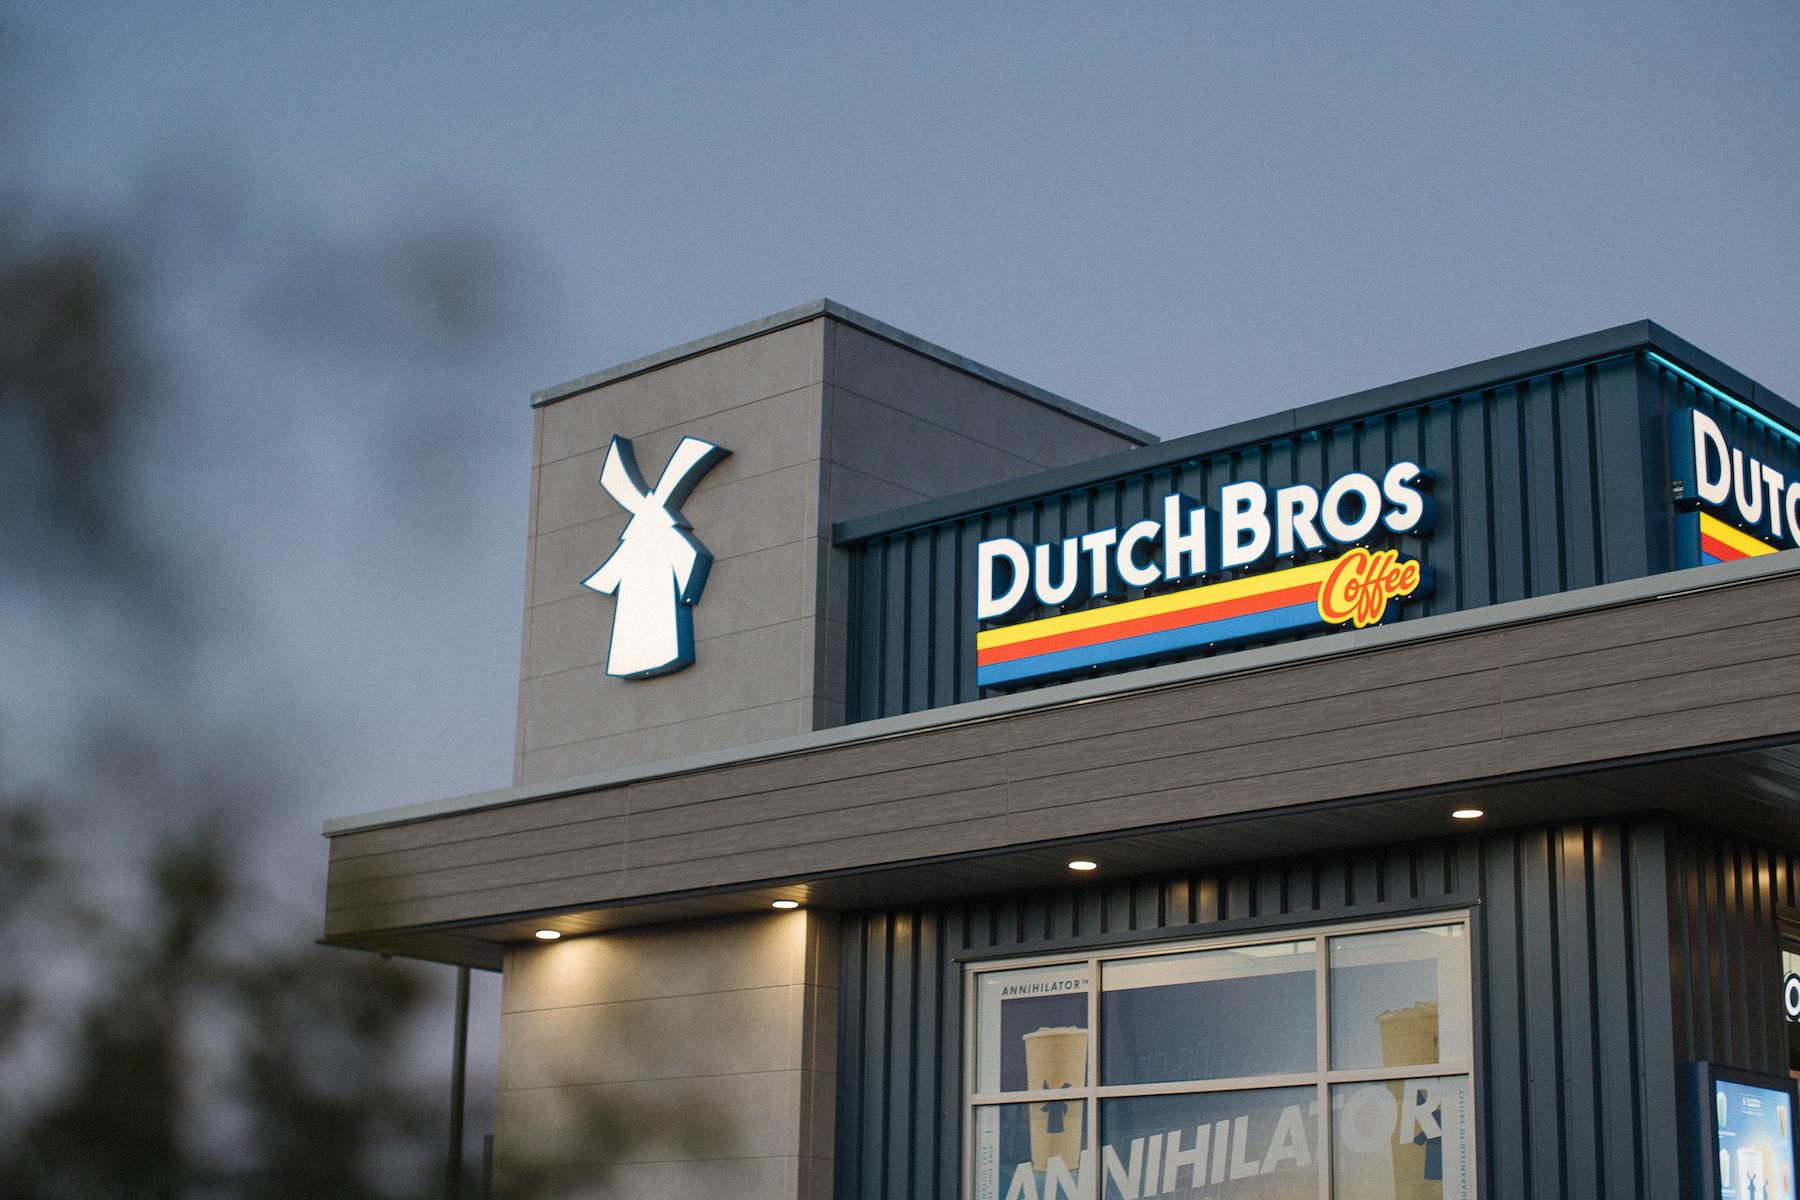 Dutch Bros Coffee Coming to Albuquerque, NM Area